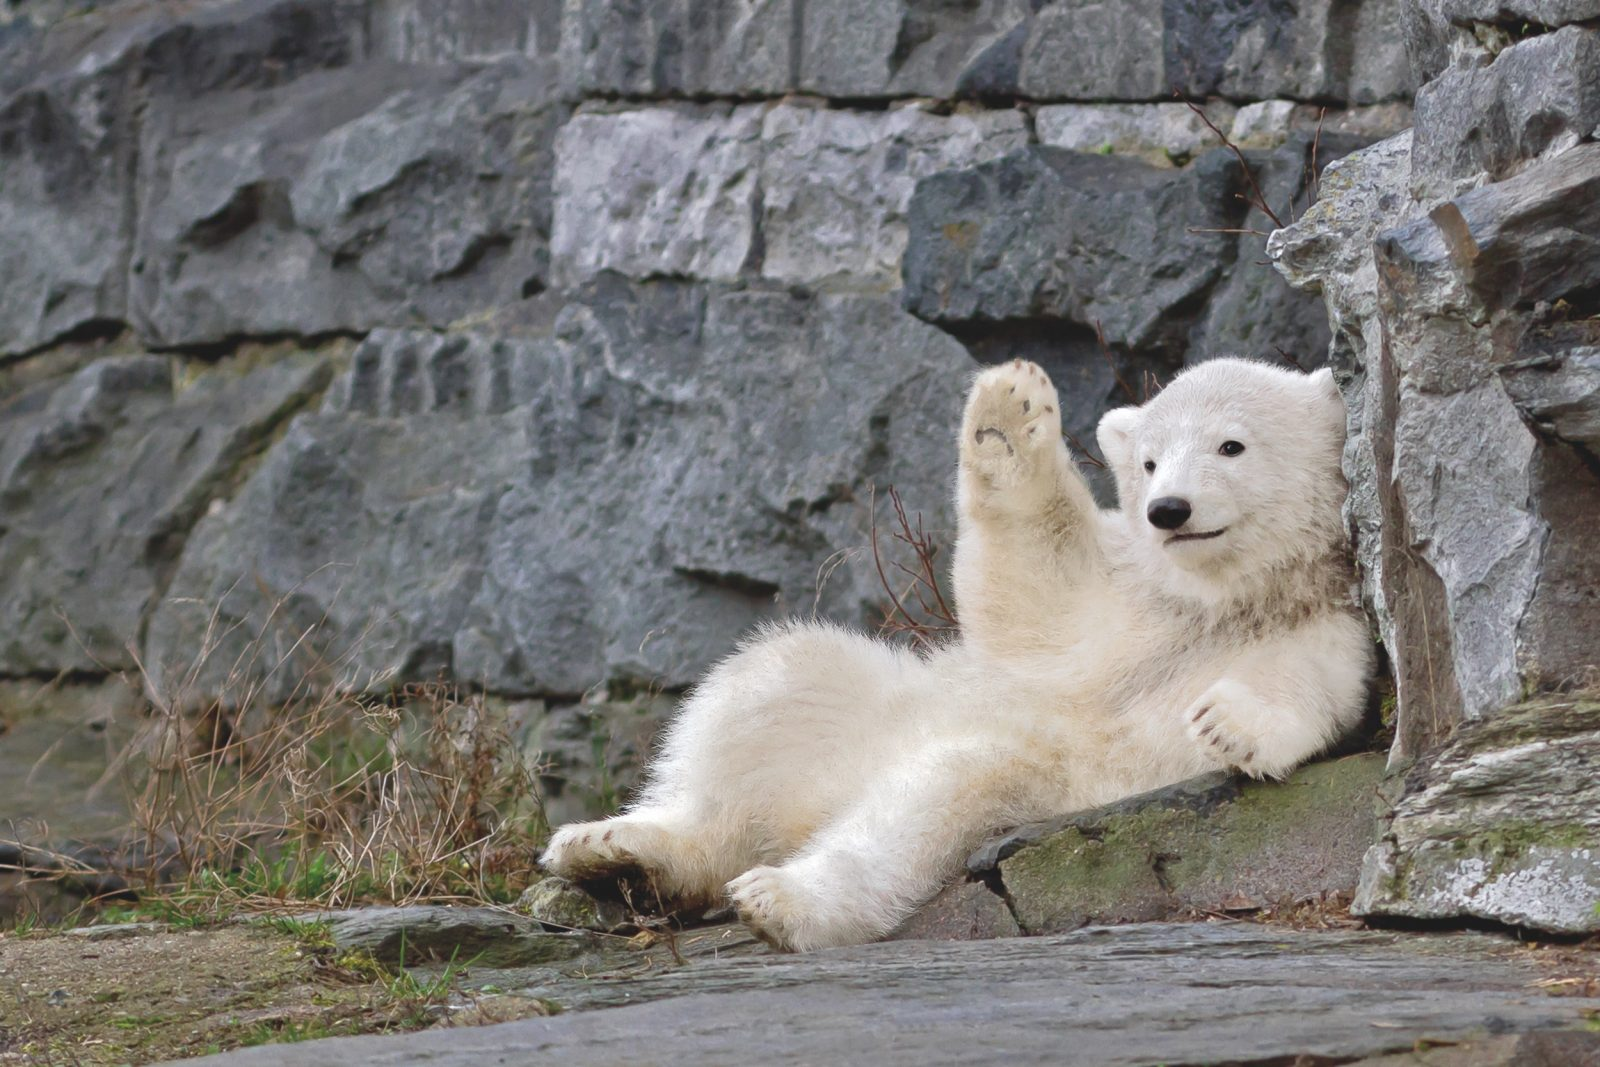 Polar bear cub Hertha waving to visitors at East Berlin's zoo Tierpark Berlin.